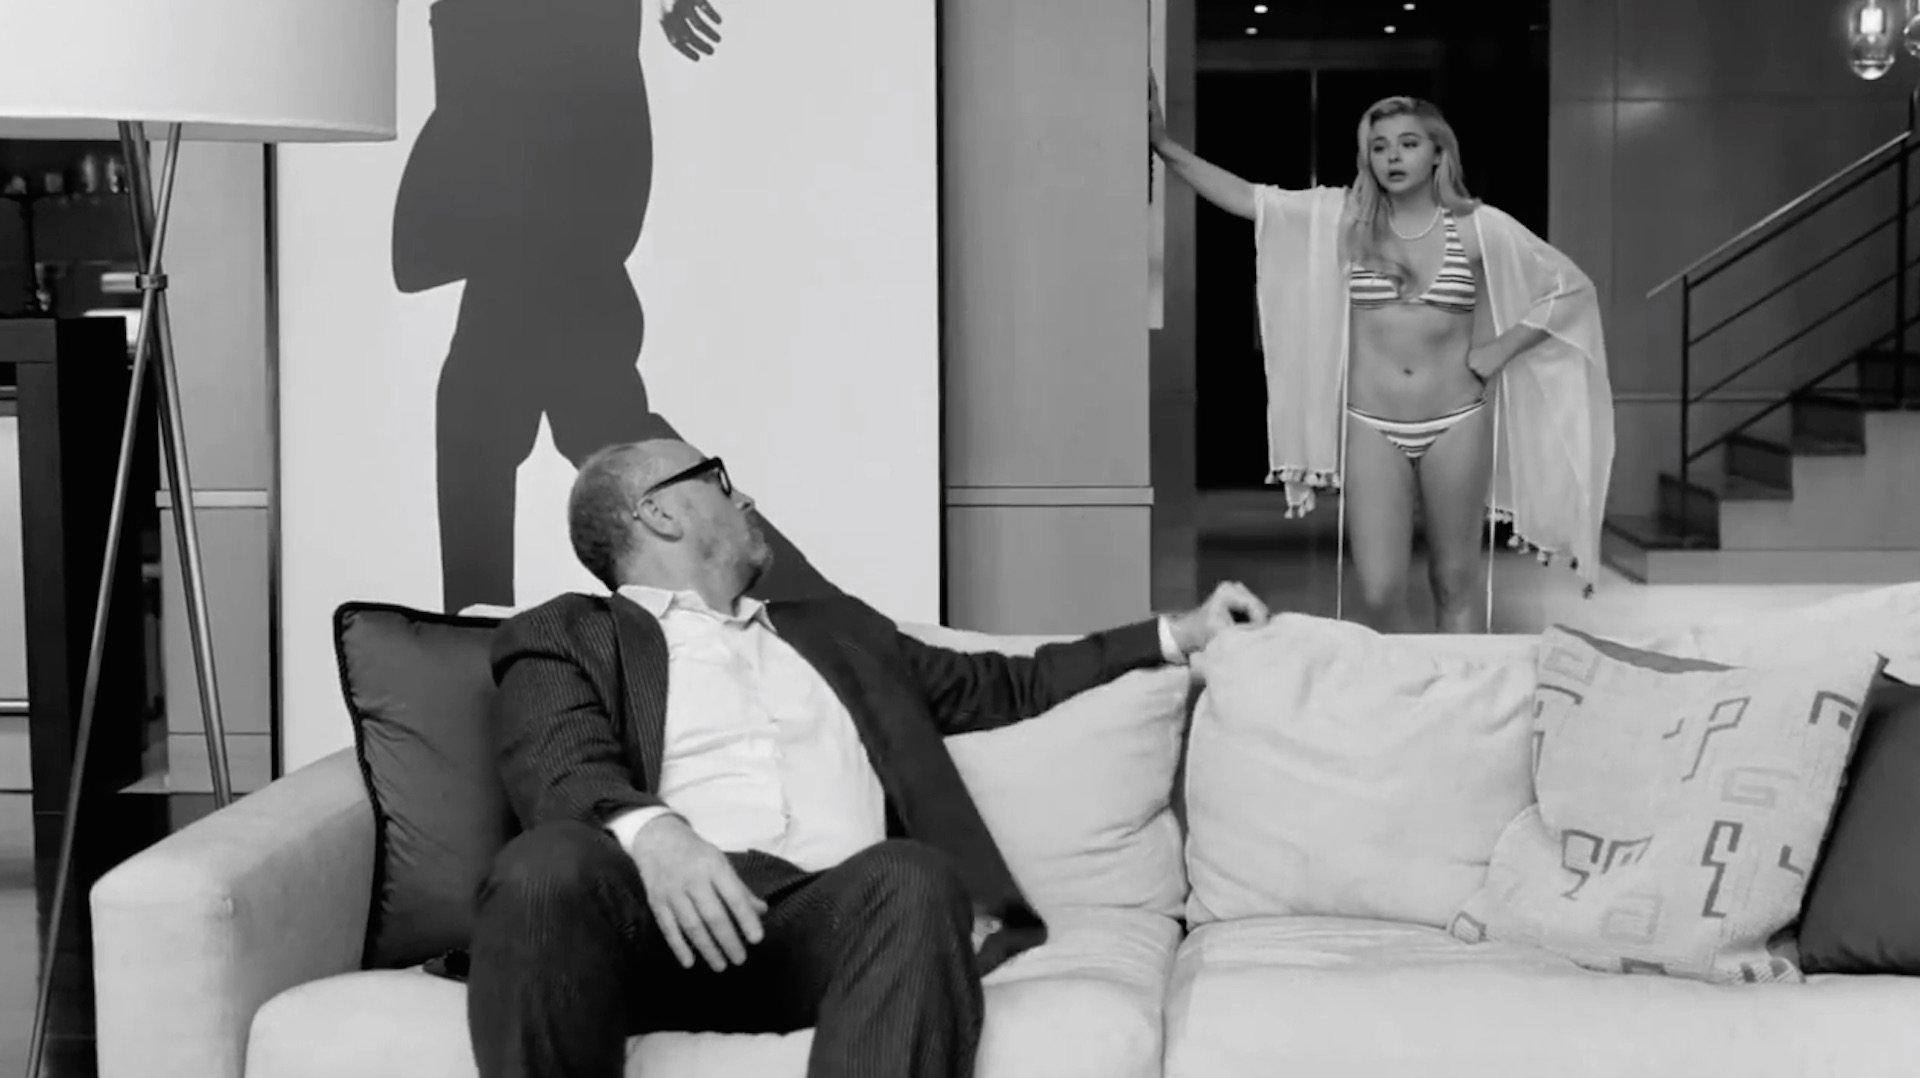 Chloe Grace Moretz I Love You Daddy Bikini photo 3